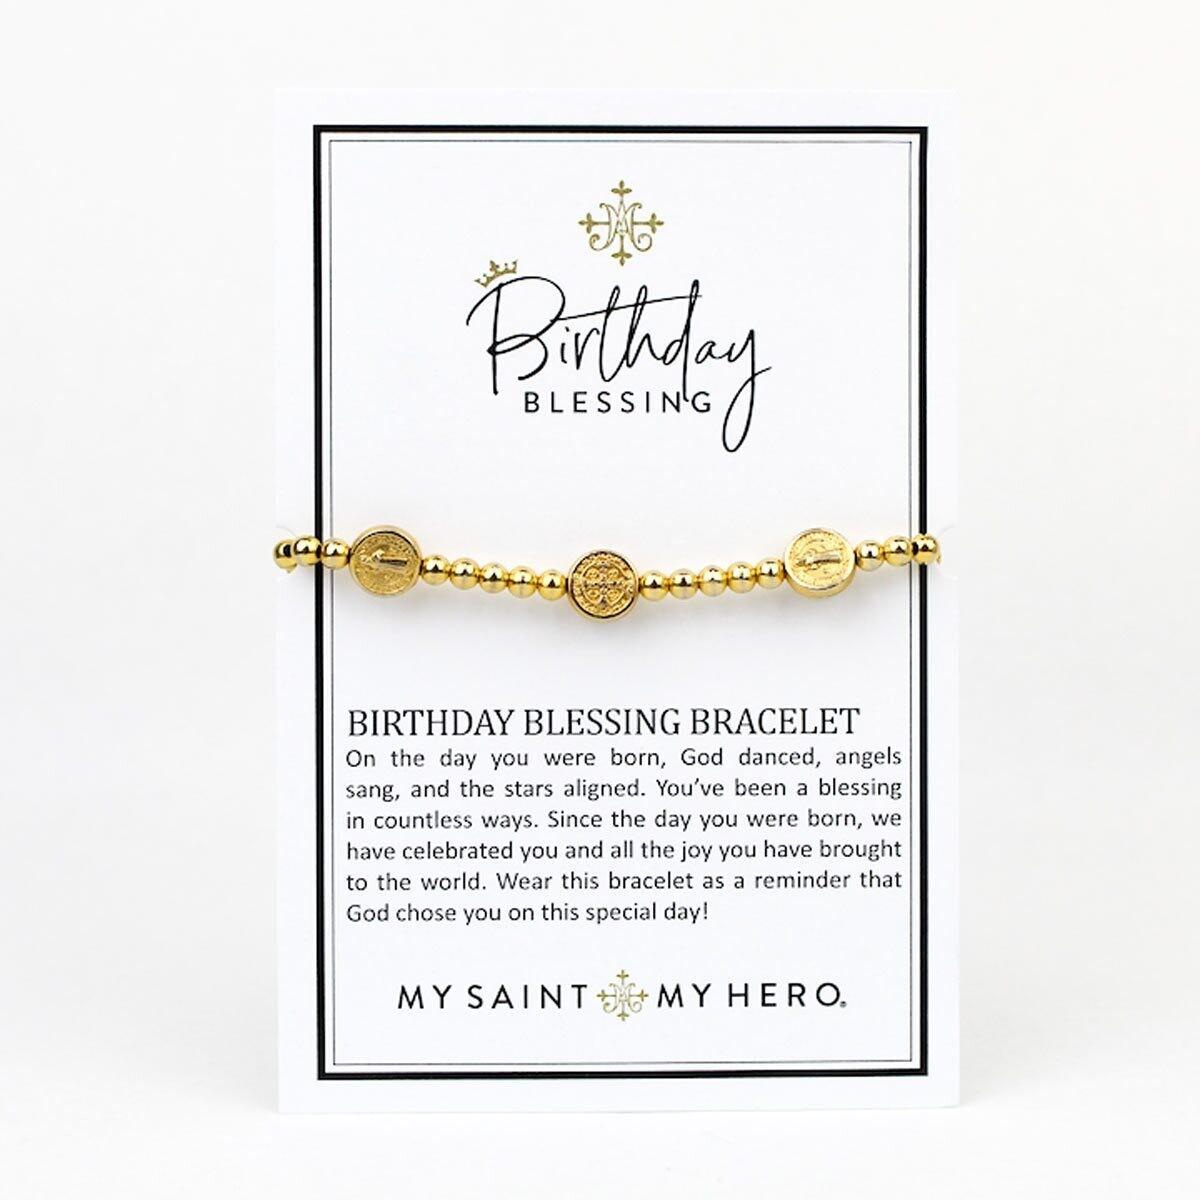 MSMH Benedictine Birthday Blessing Bracelet (Gold)